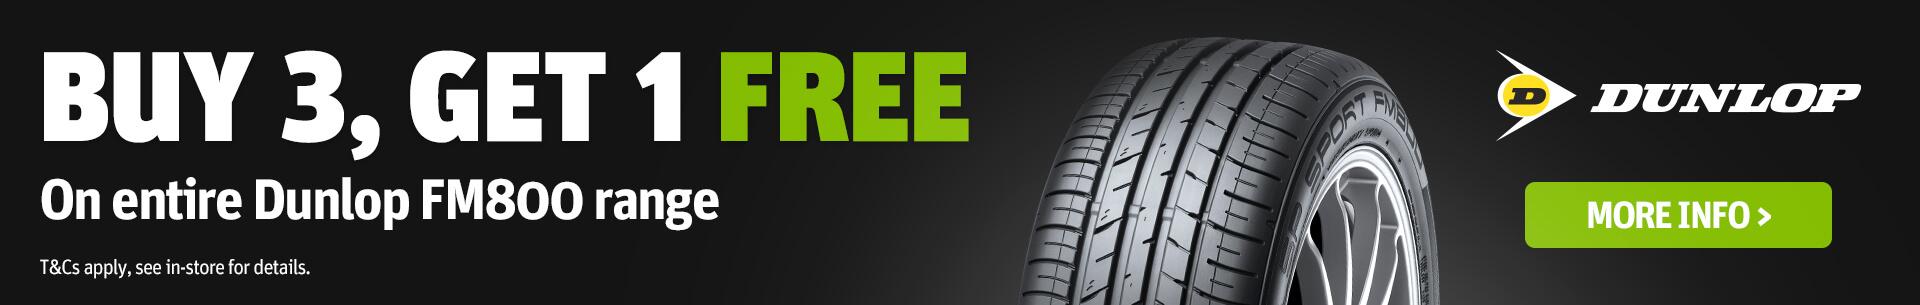 Dunlop SP Sport FM800 Buy Three Get One Free Promotion